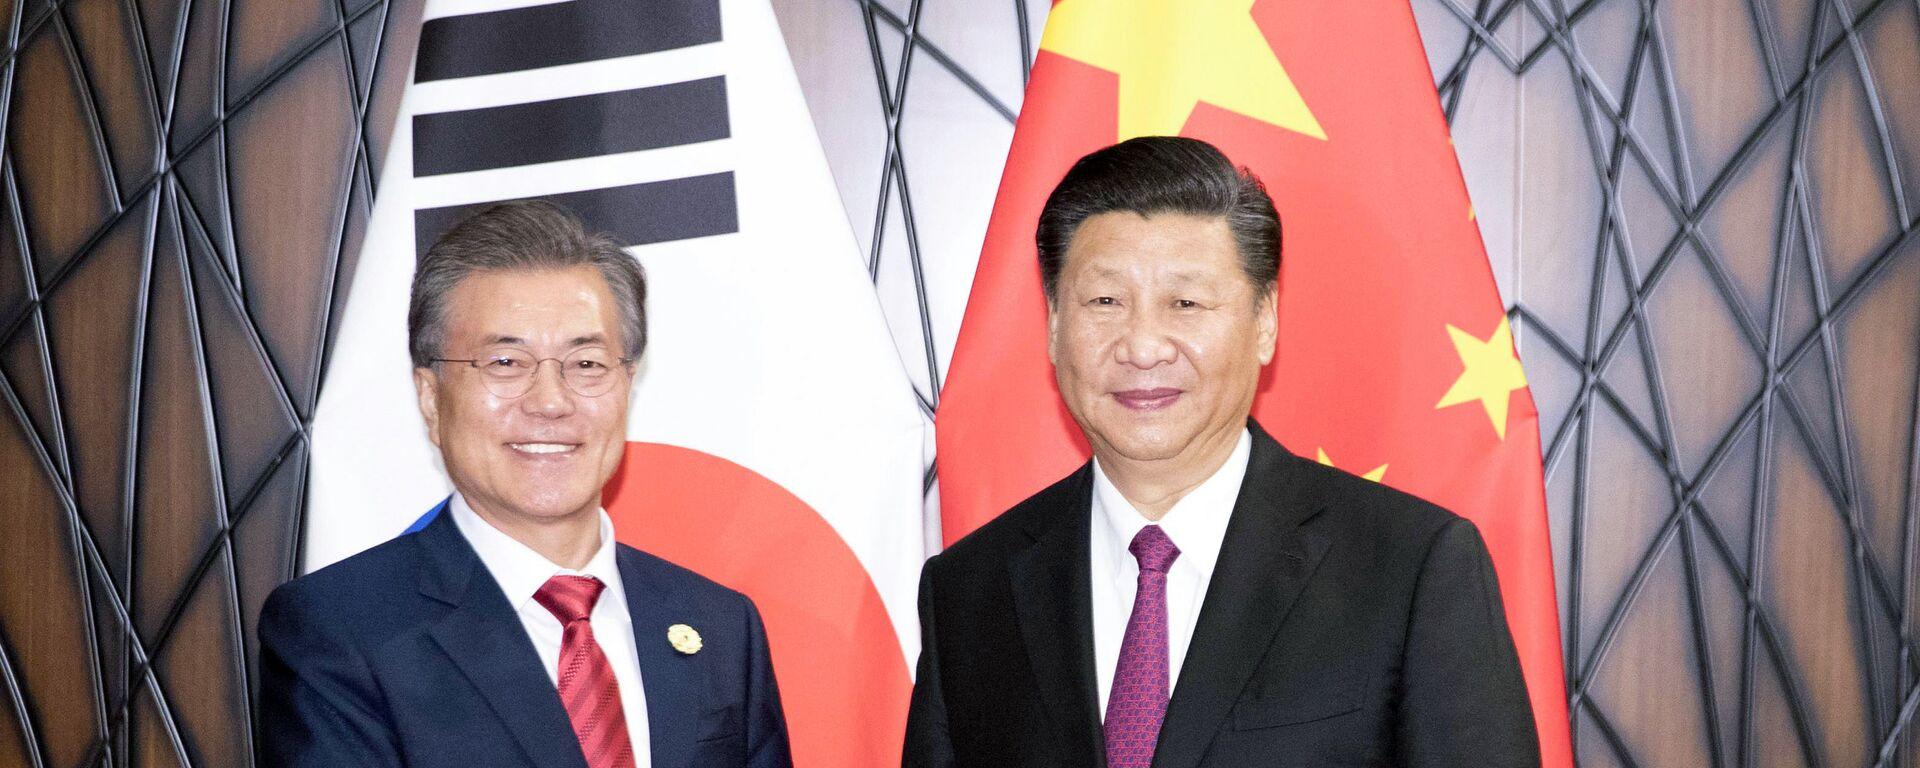 Il presidente cinese Xi Jinping e la sua controparte sudcoreana Moon Jae-in - Sputnik Italia, 1920, 01.06.2021